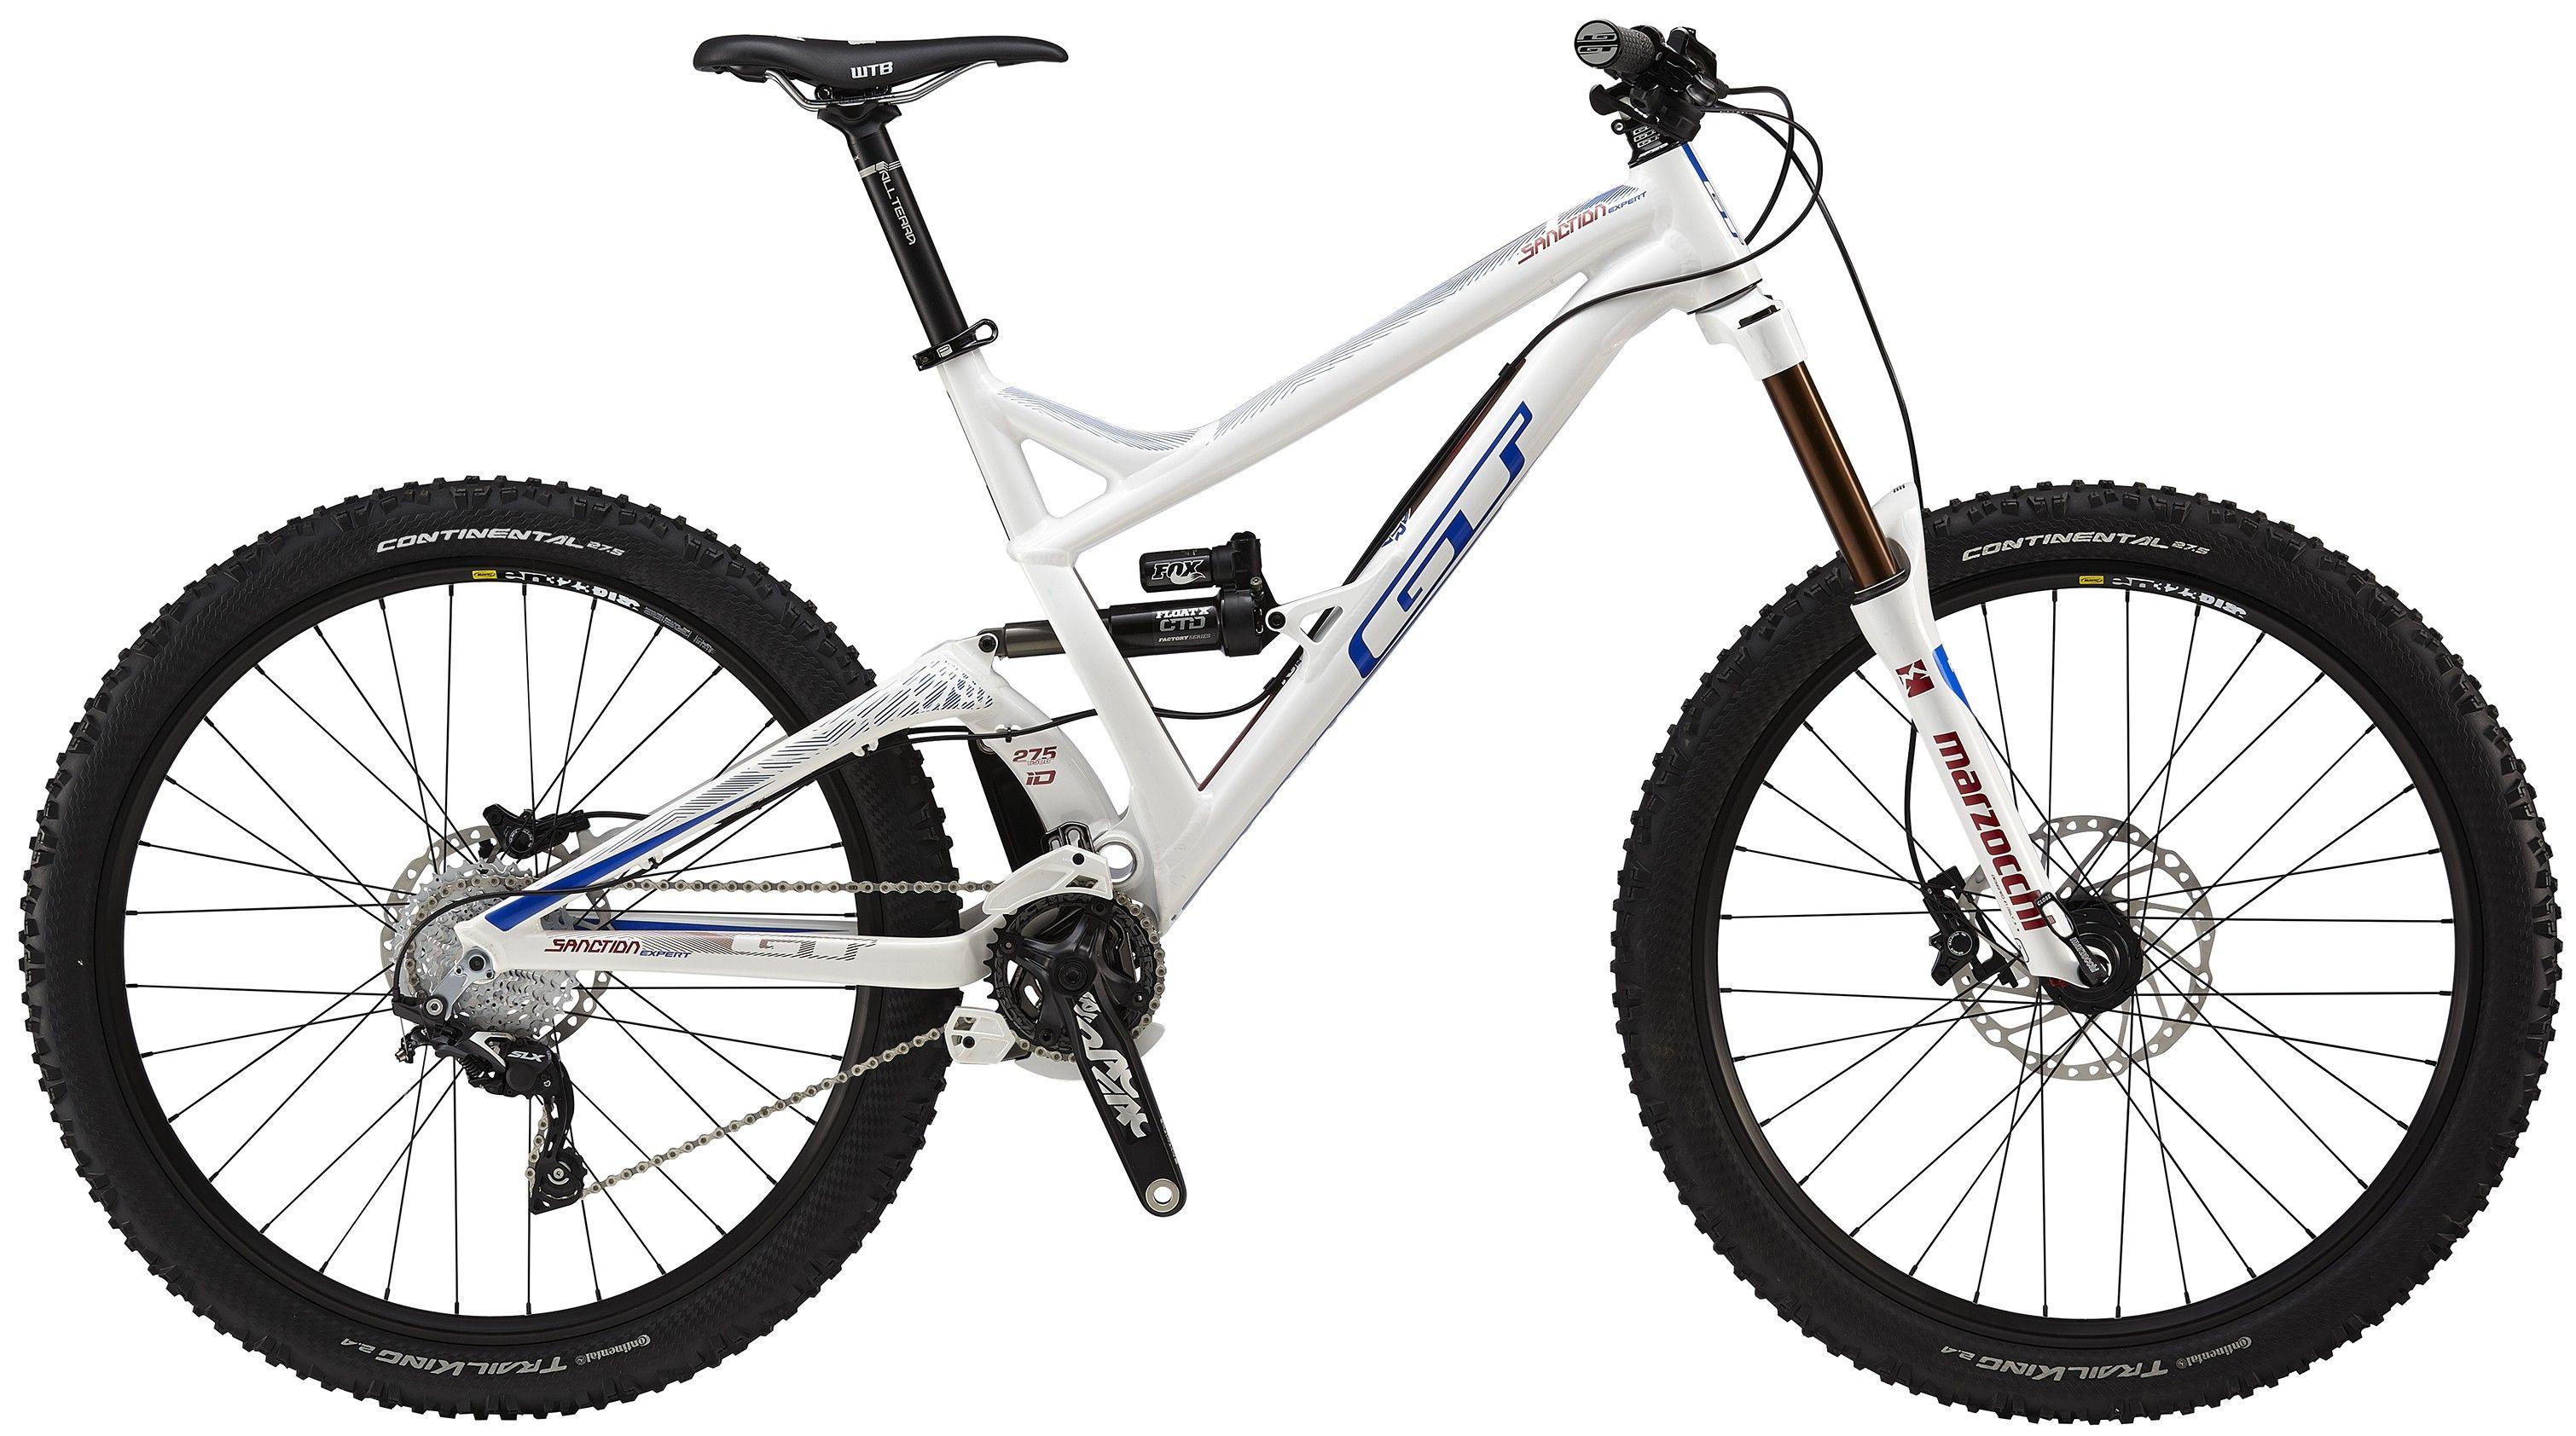 Sanction Expert Gravity Mountain Bikes Mountain Biking